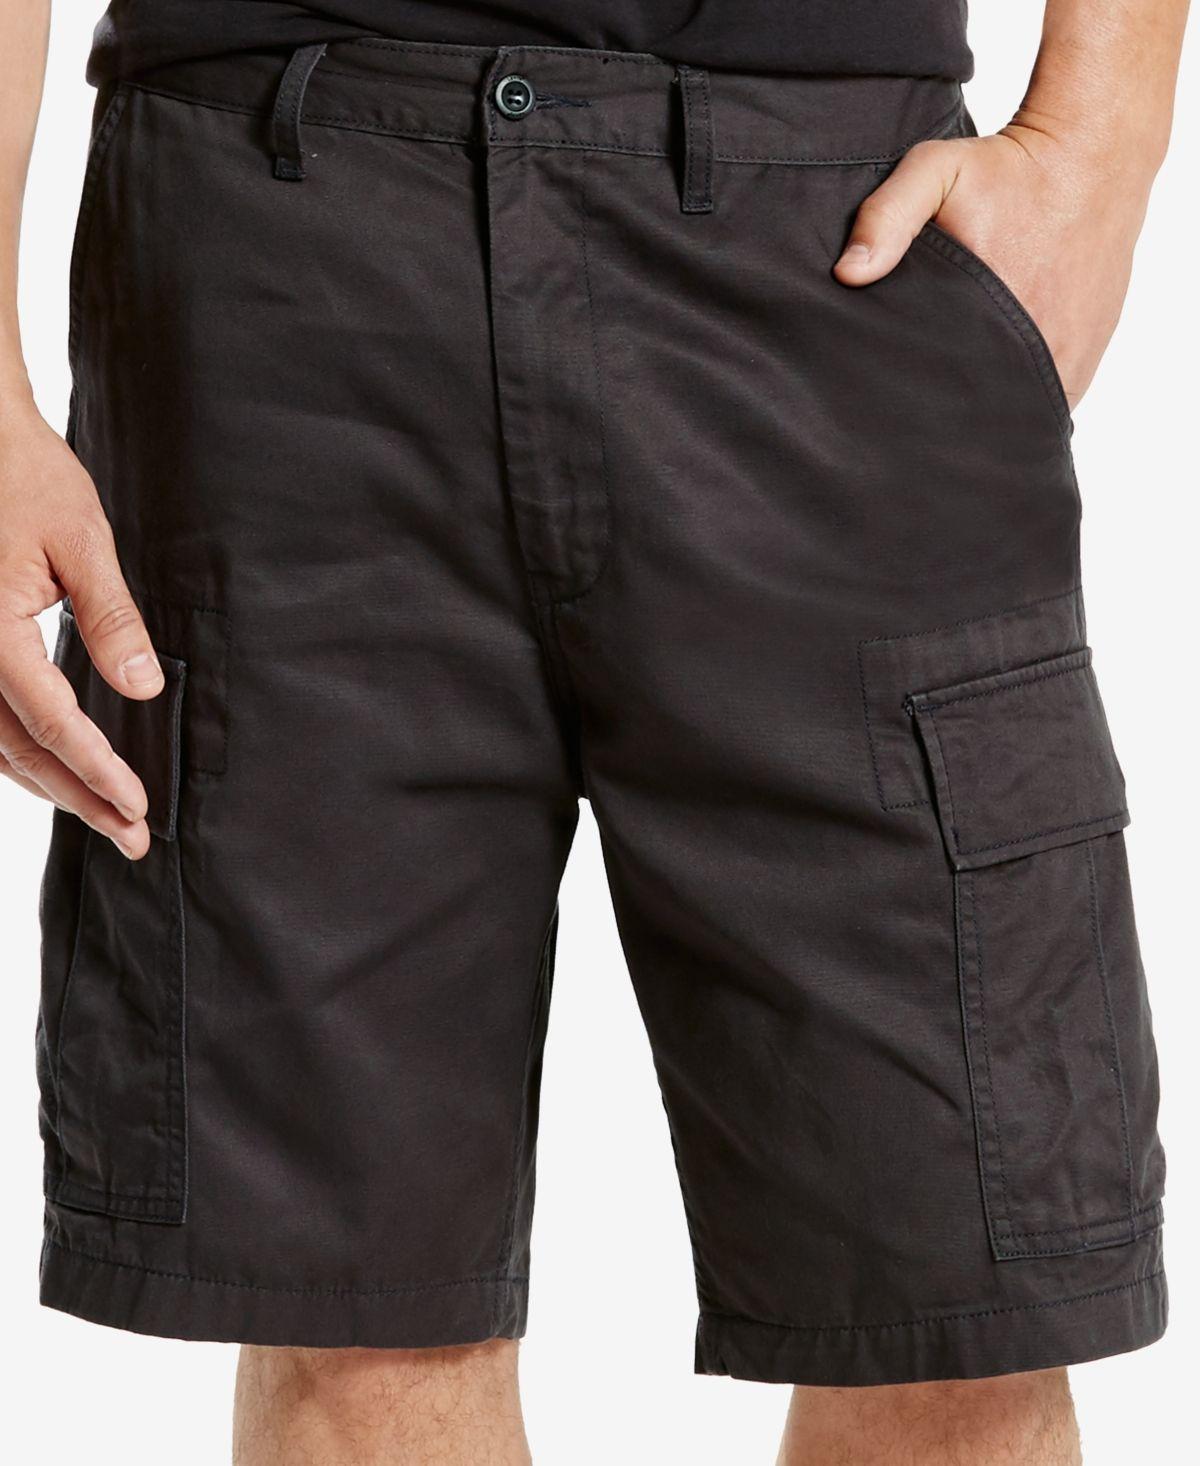 Pin By John Monzingo On Johnwalter In 2020 Cargo Shorts Mens Big And Tall Cargo Shorts Men [ 1466 x 1200 Pixel ]